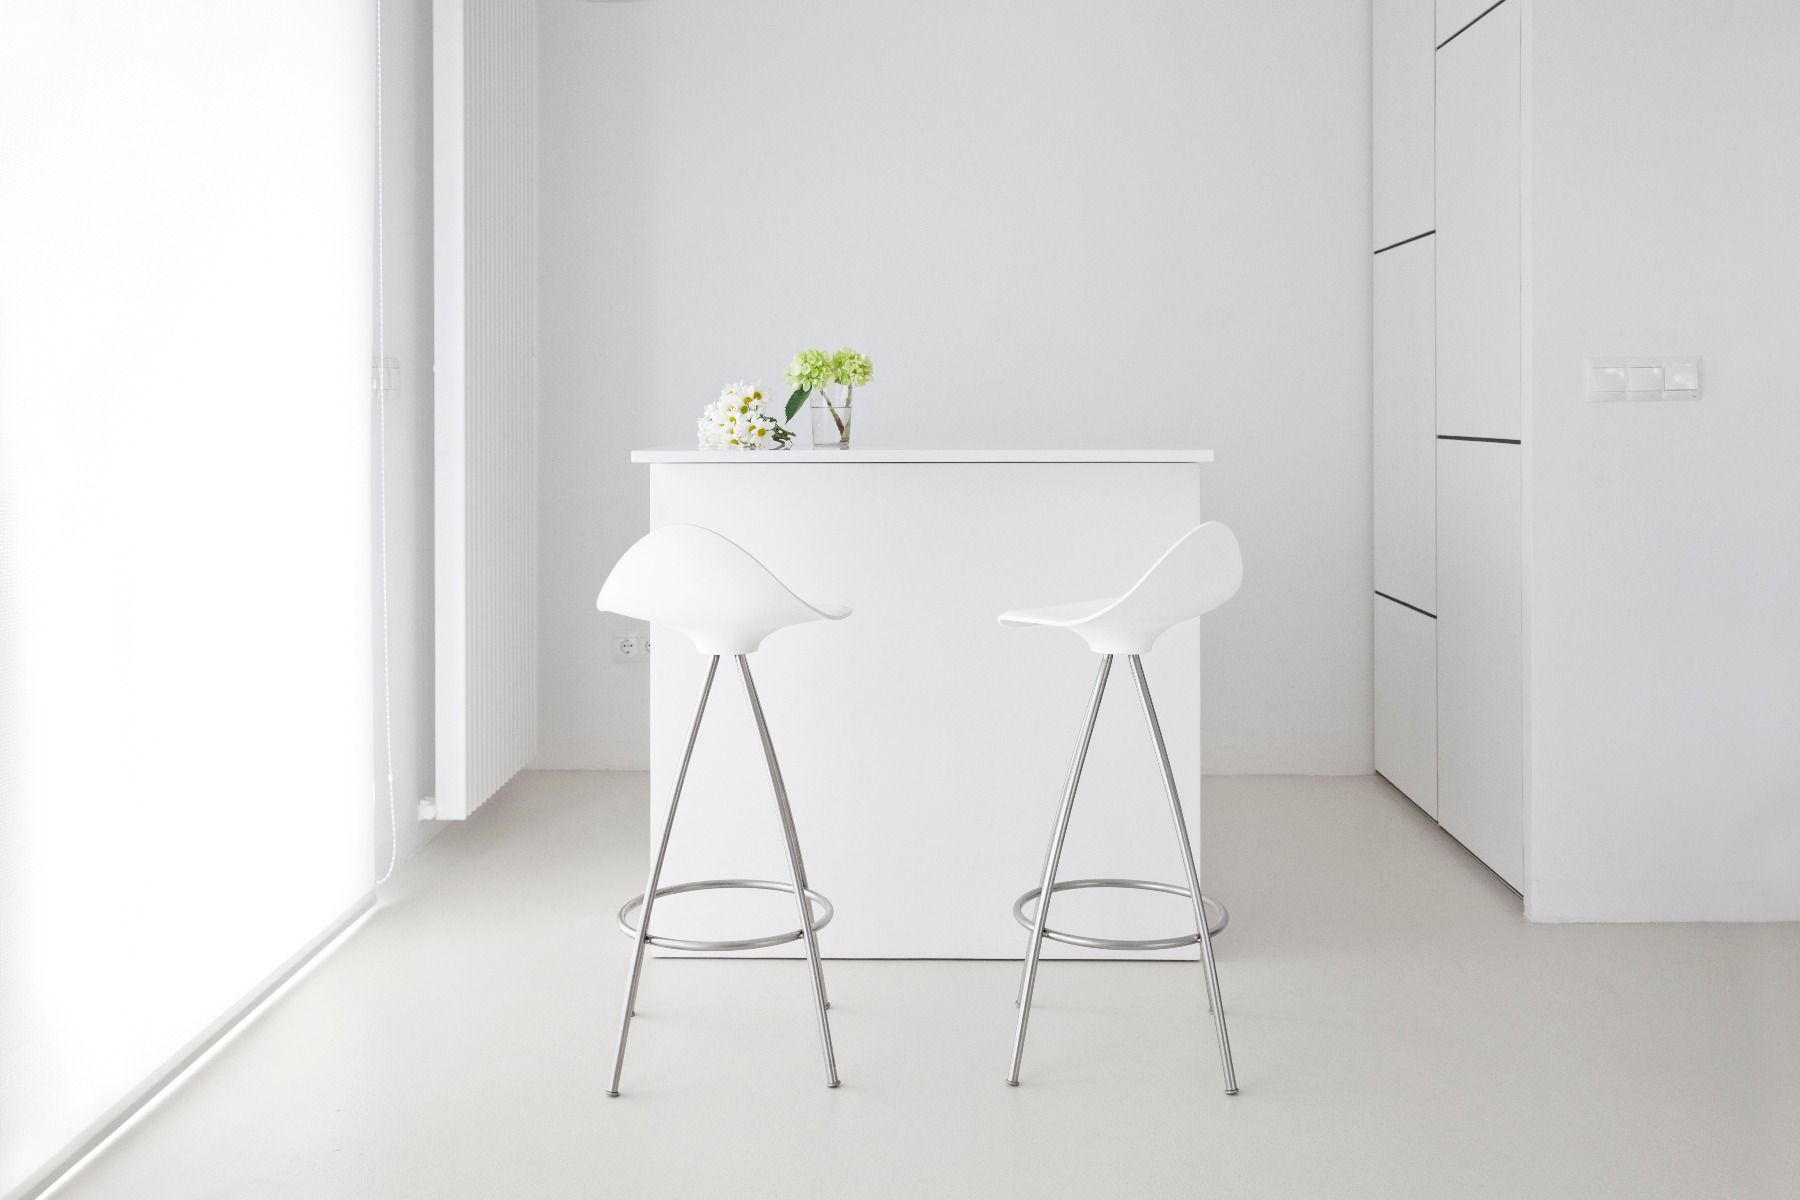 STUA Onda swivel monochrome bar stool in a white interior